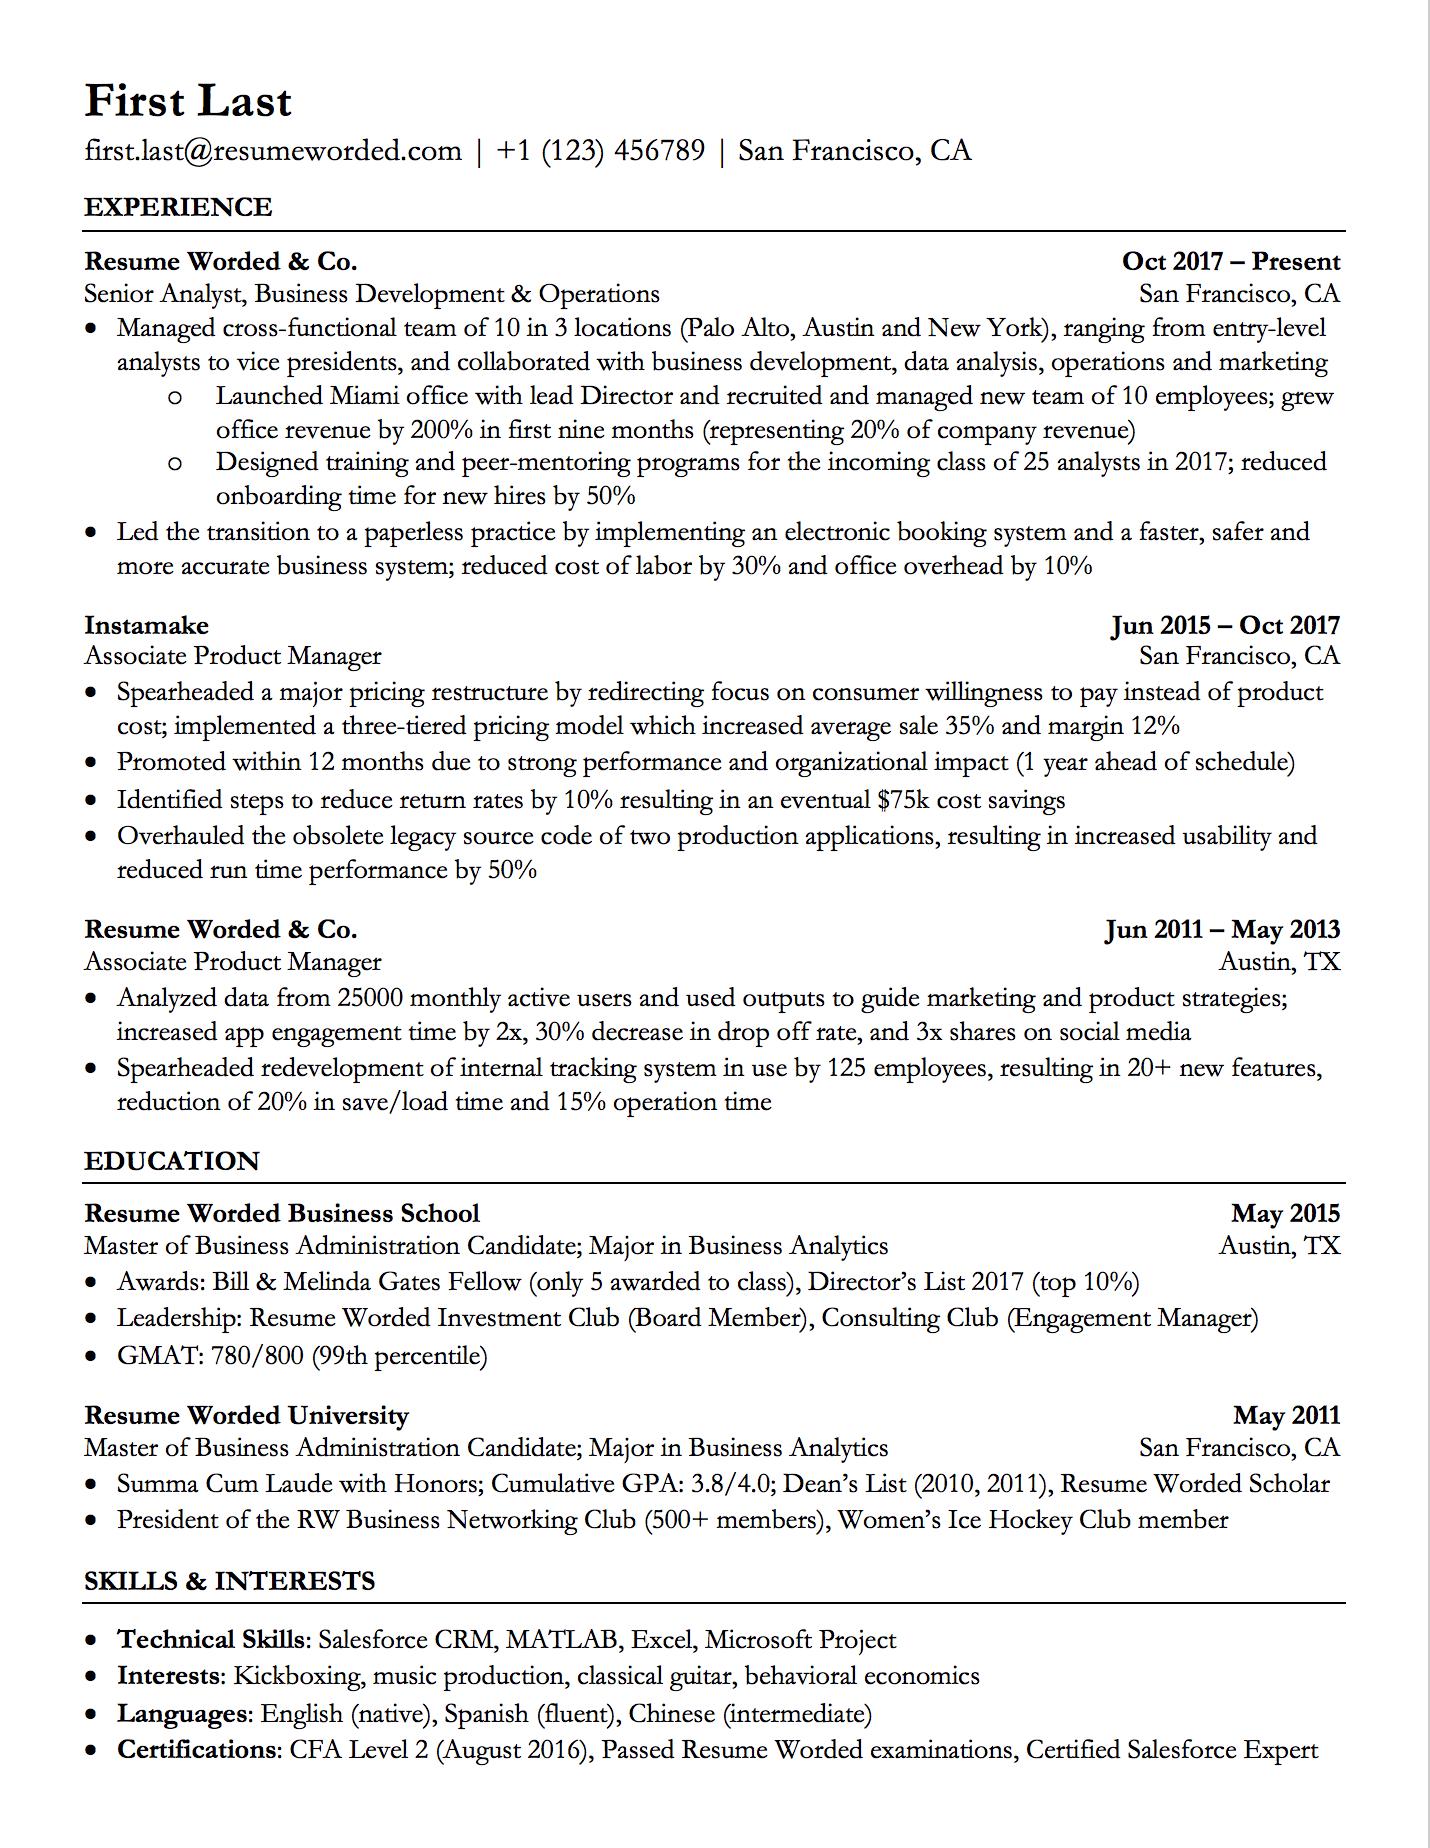 Free Robotfriendly Resume Templates in 2020 Job resume